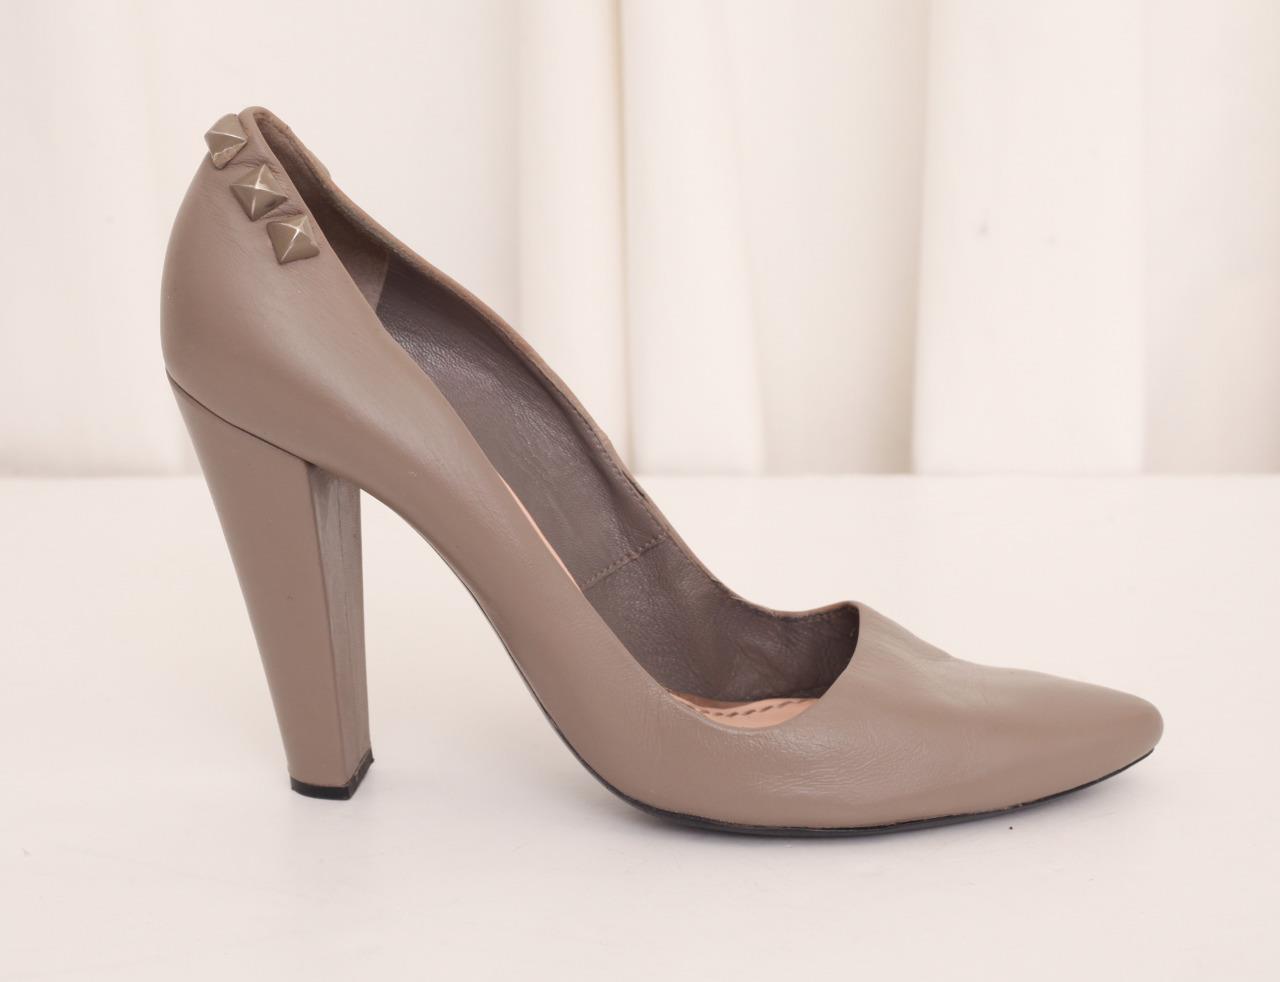 MARC JACOBS Damenschuhe Taupe Leder Studded Pointy-Toe High-Heel Pump Schuhe 11-41